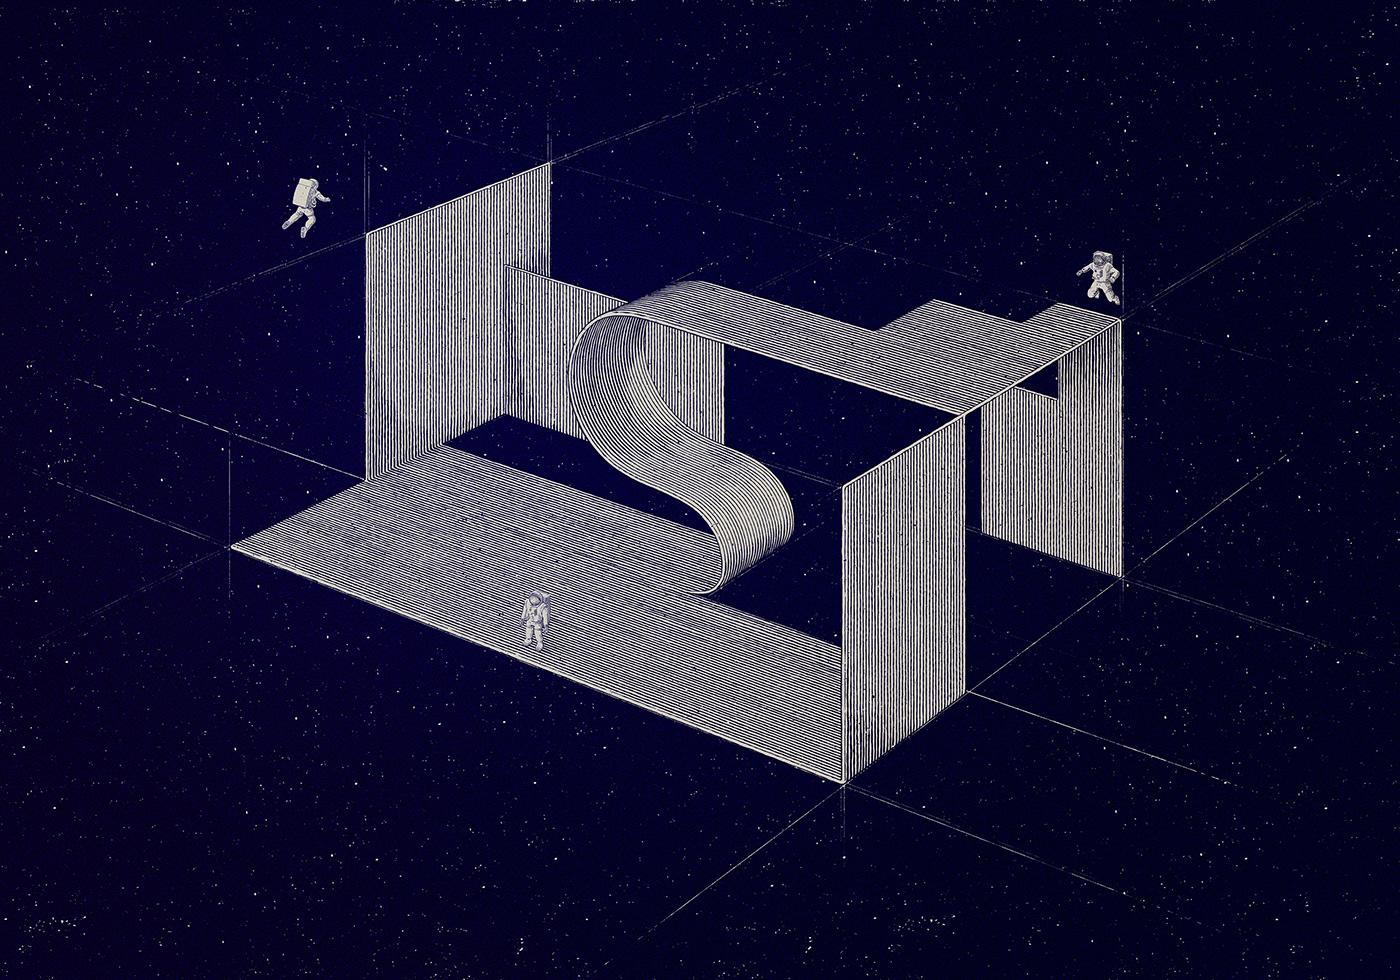 print constructivism katarzyna kobro Strzeminski bauhaus poster skate Space  astronaut geometry